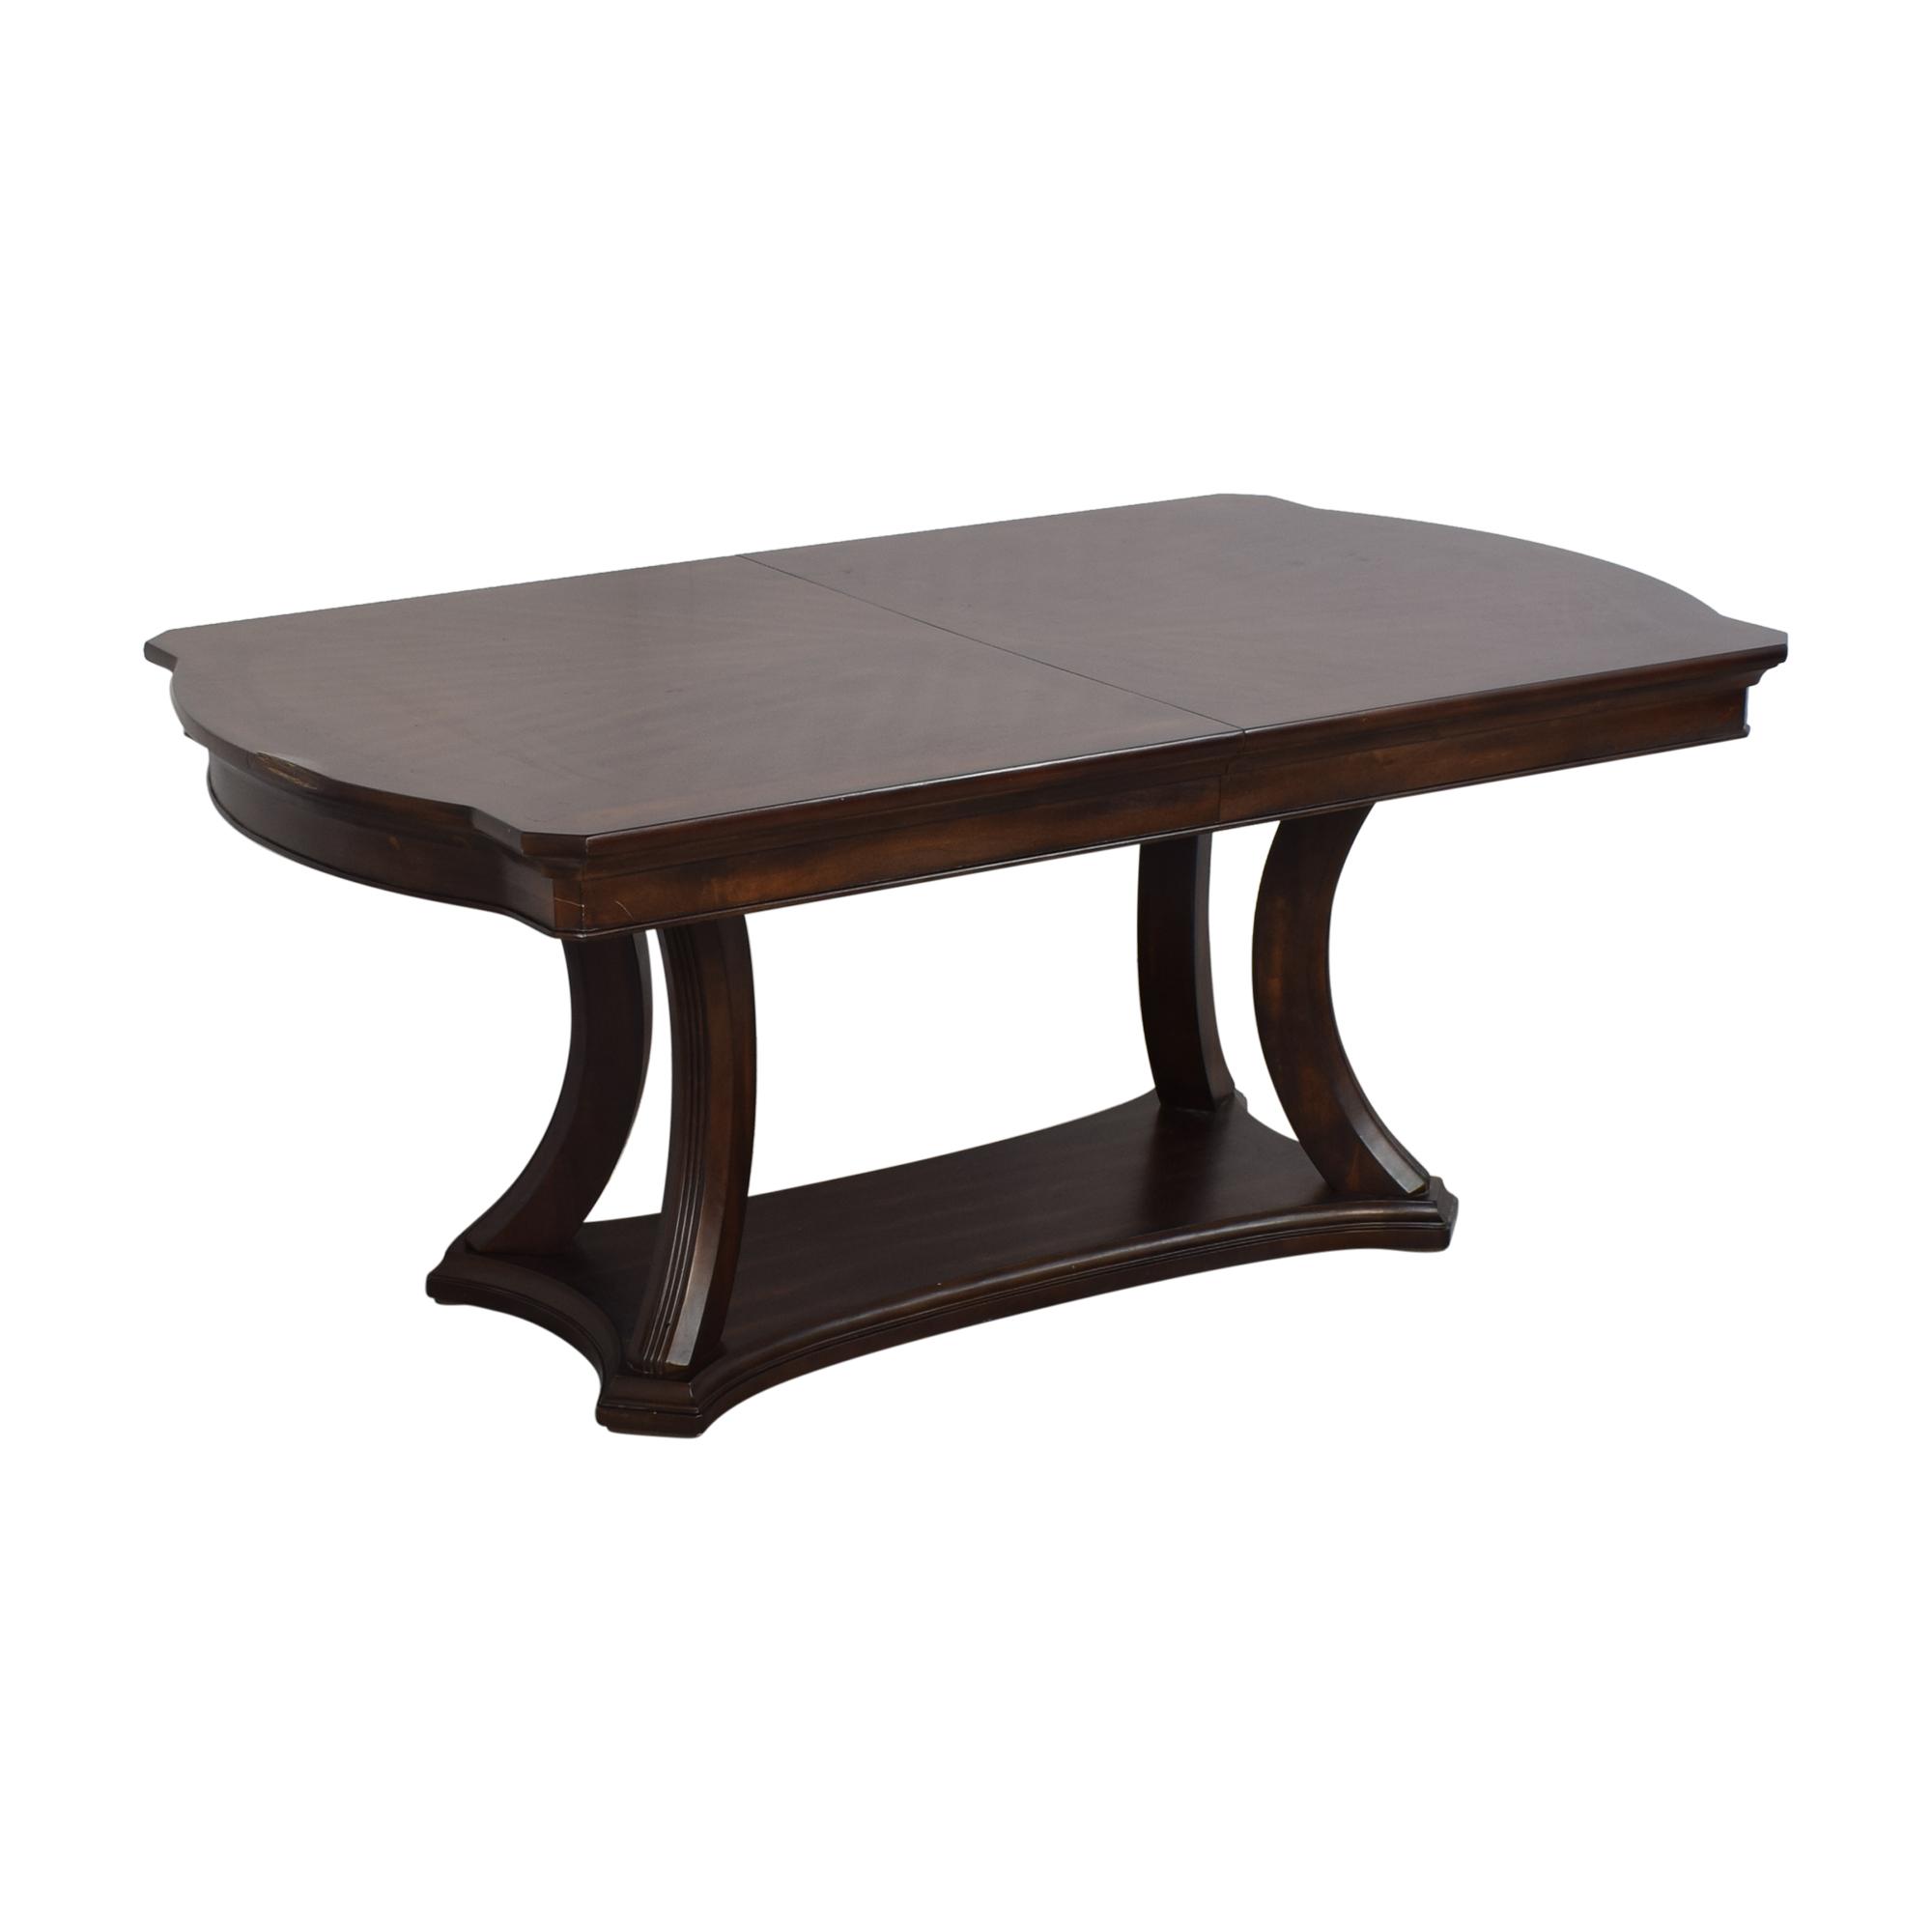 Pedestal Base Extendable Dining Table Dinner Tables